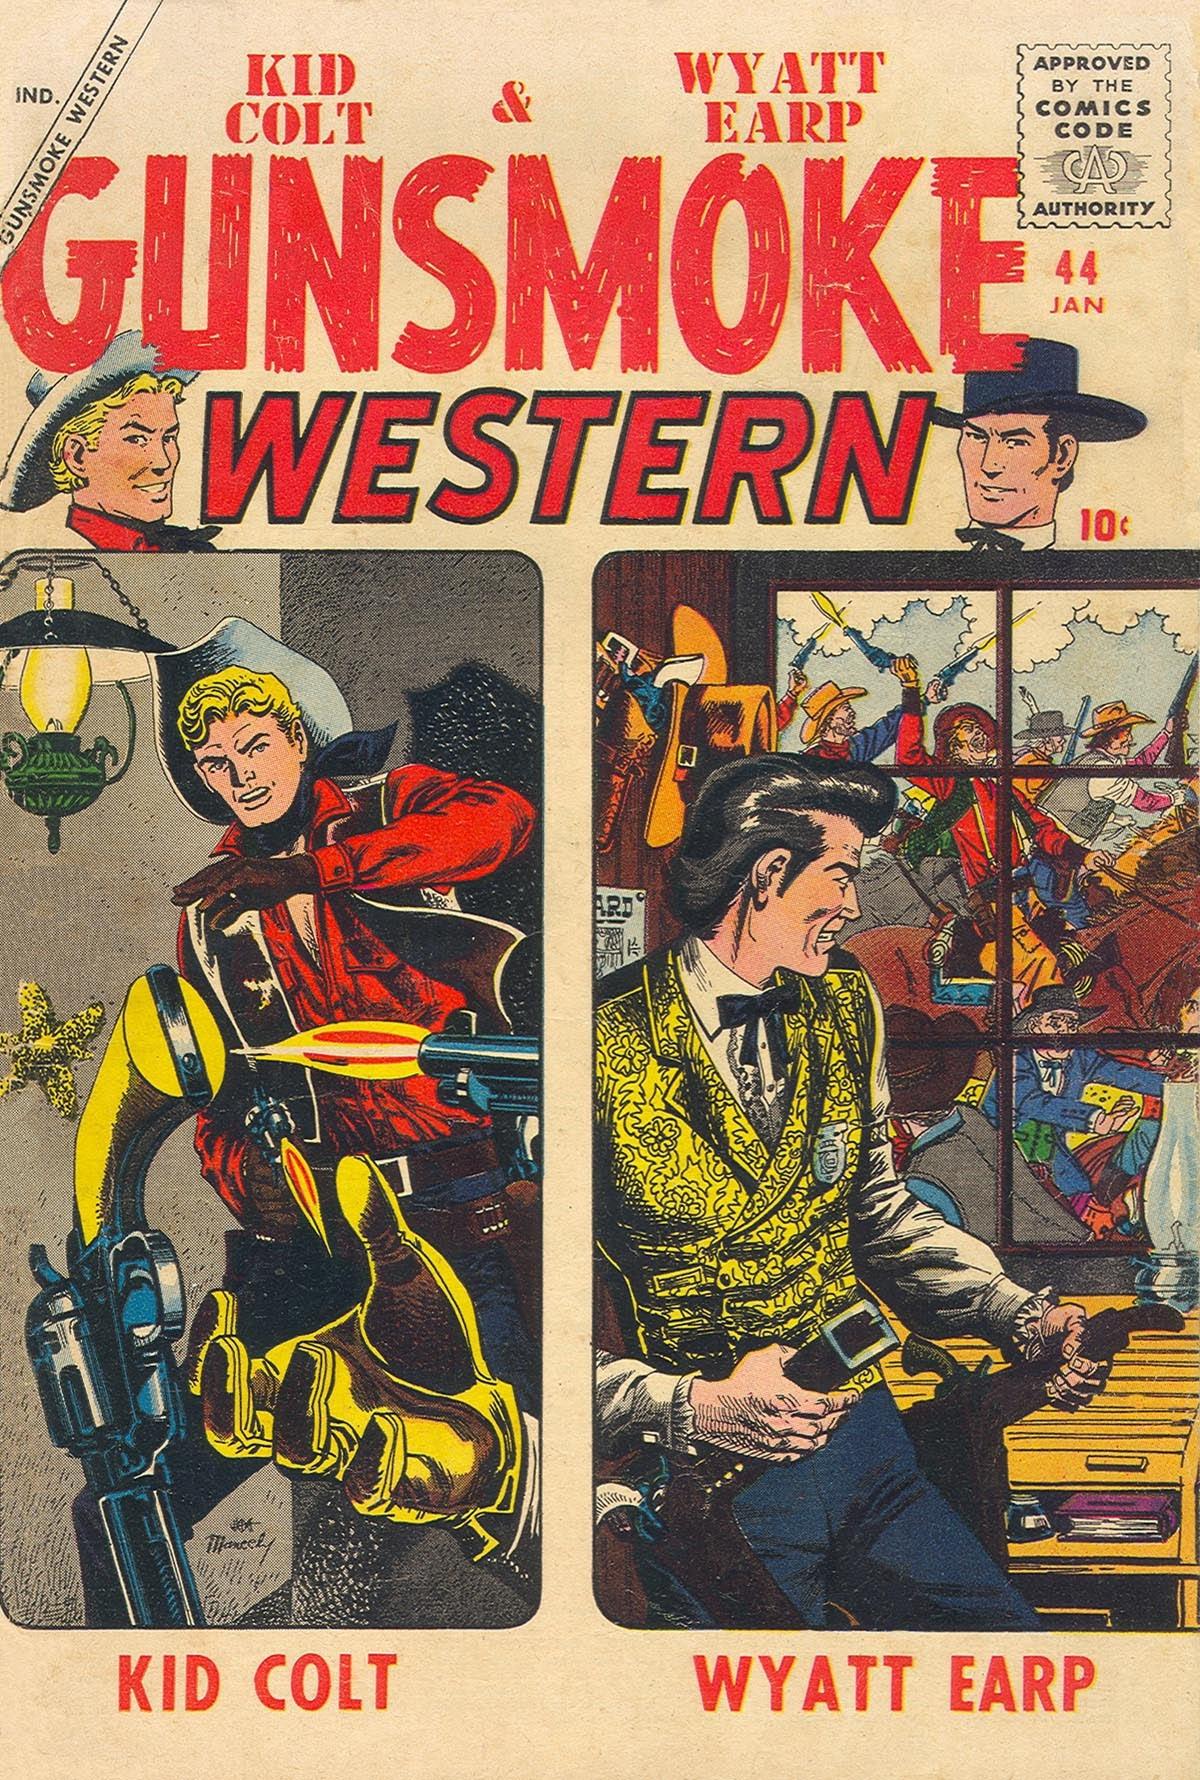 Gunsmoke Western 44 Page 1